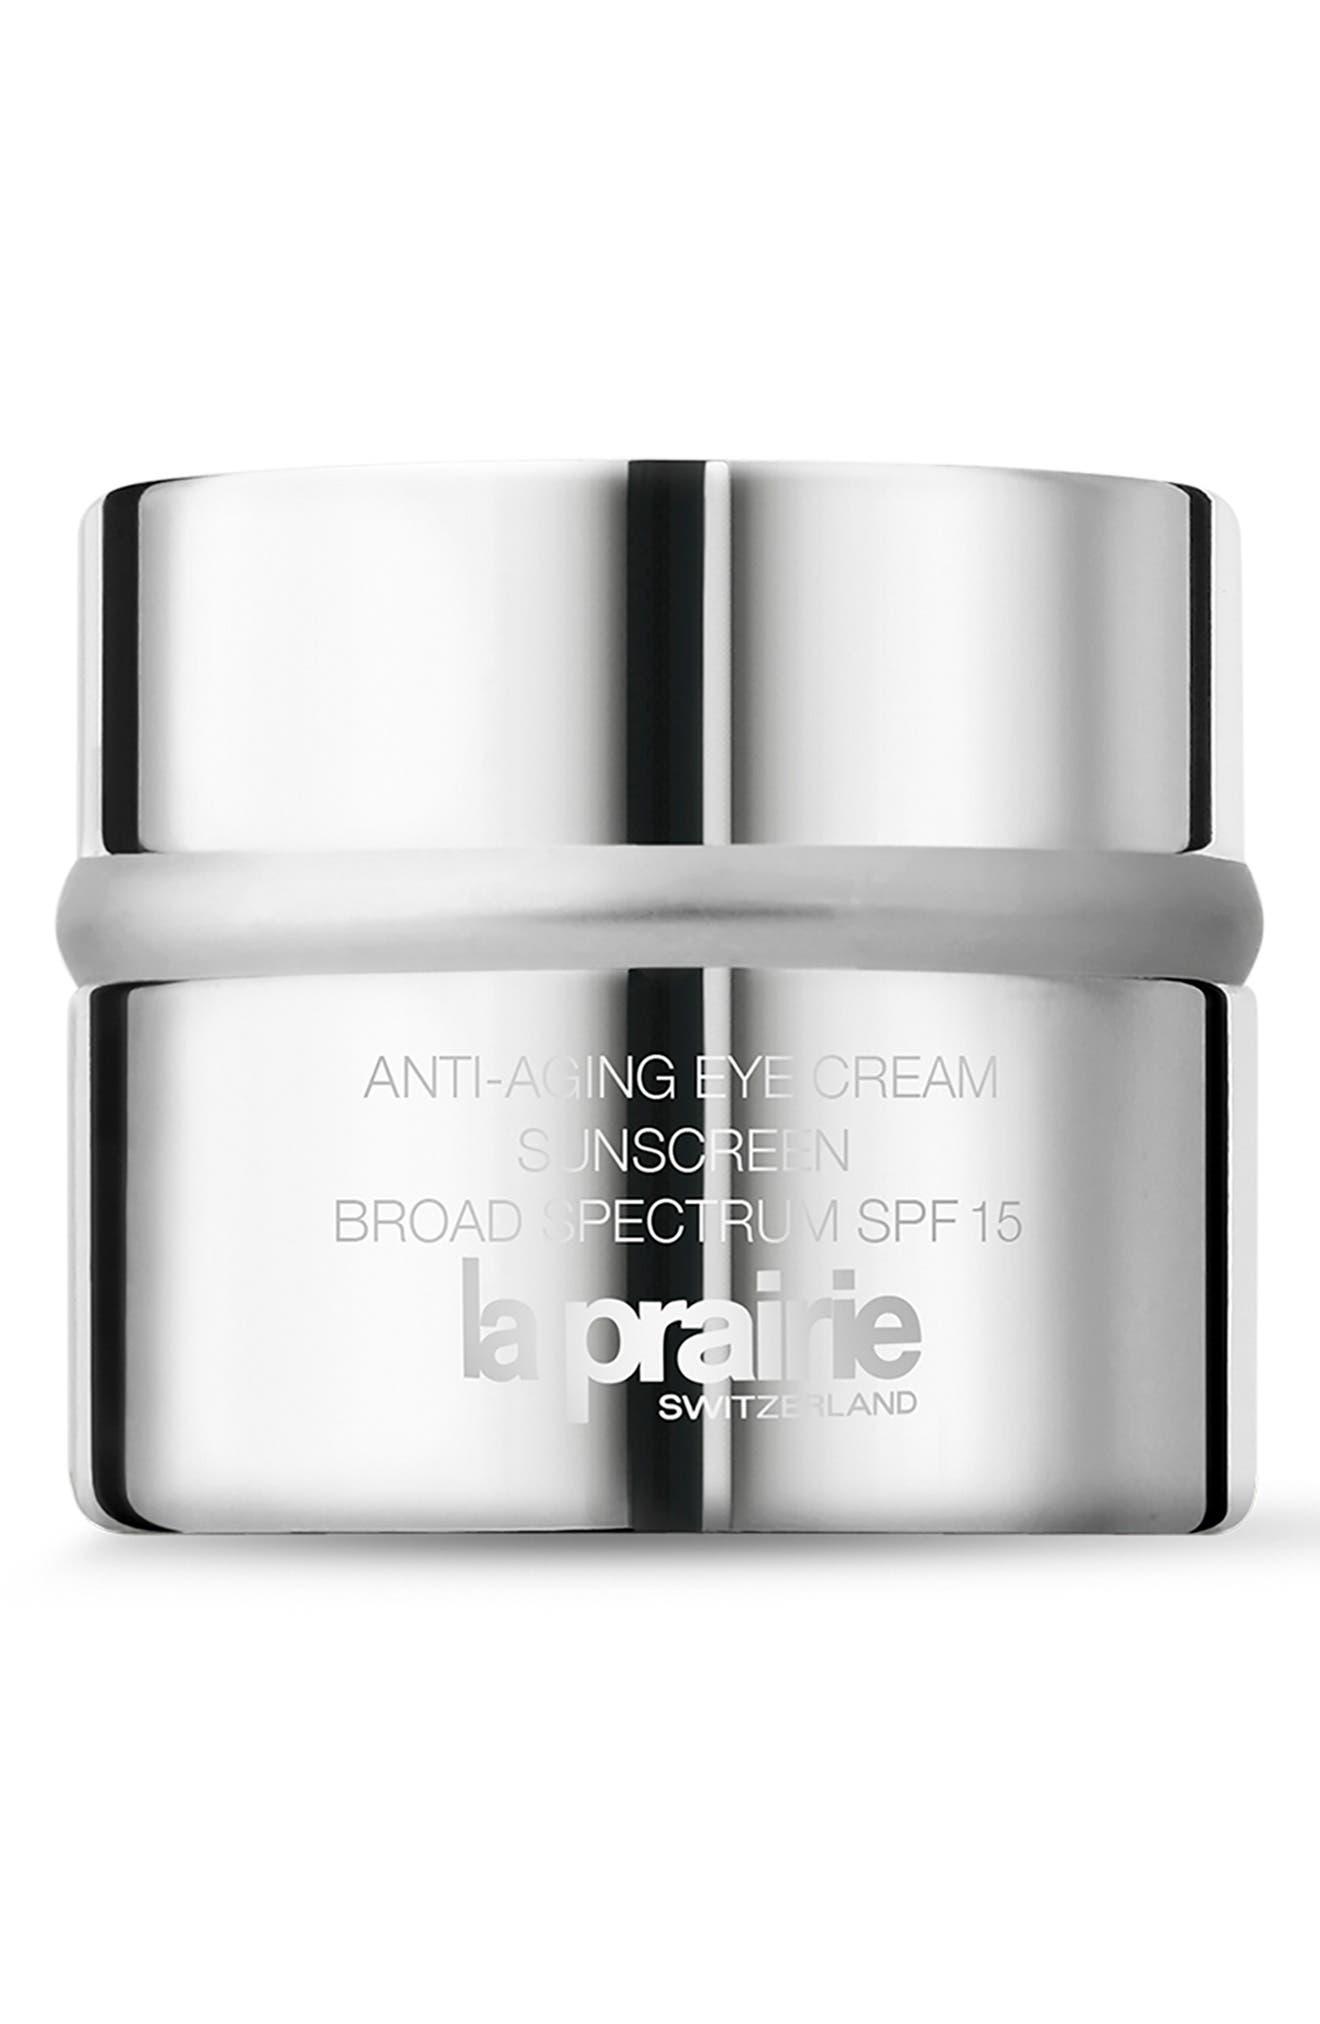 LA PRAIRIE, Anti-Aging Eye Cream Sunscreen Broad Spectrum SPF 15, Main thumbnail 1, color, NO COLOR